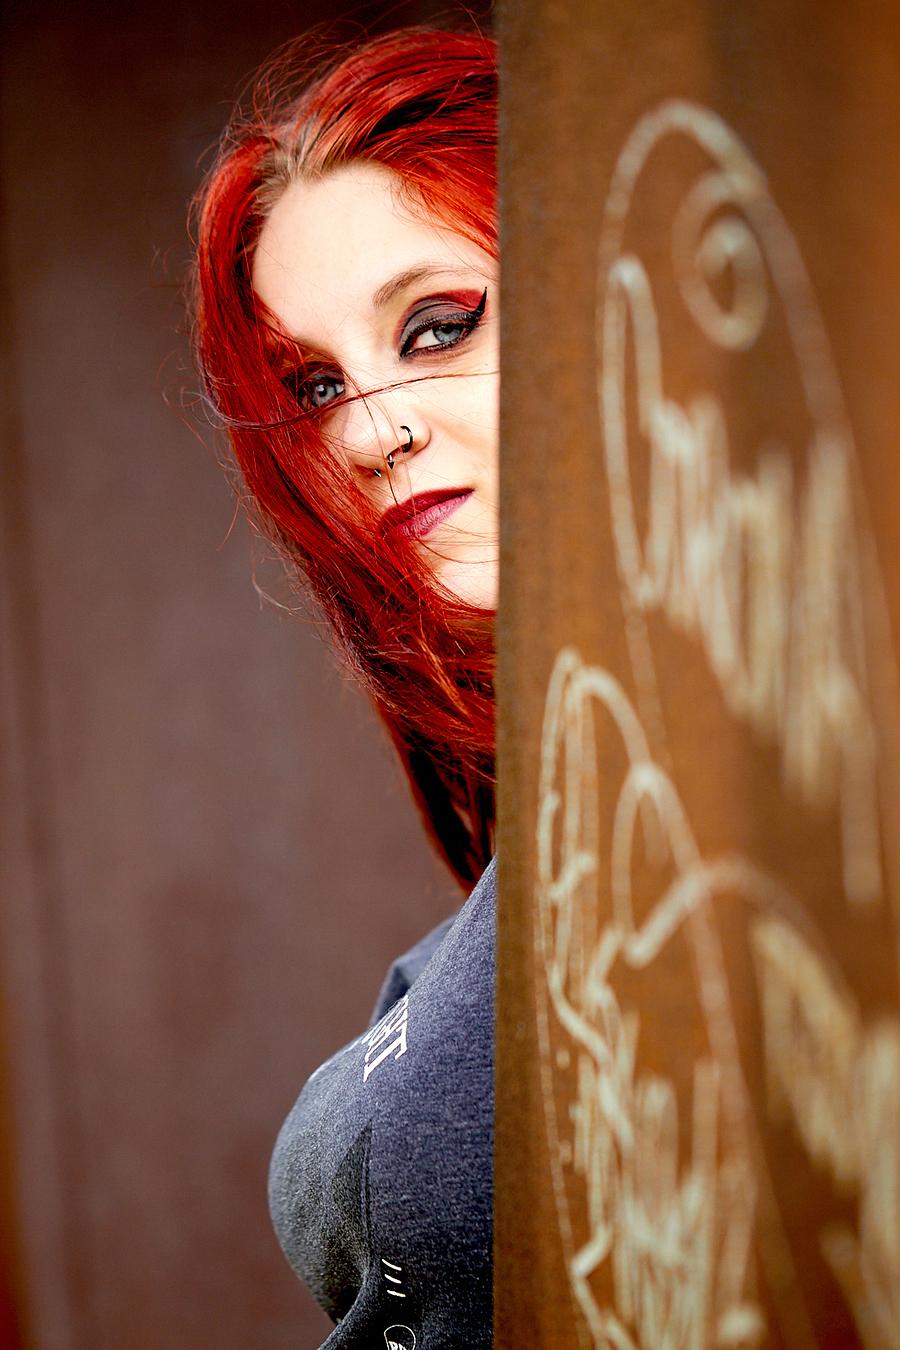 Photography by Nils, Model Paige Coles, Makeup by Paige Coles, Stylist Paige Coles / Uploaded 10th August 2020 @ 09:06 AM